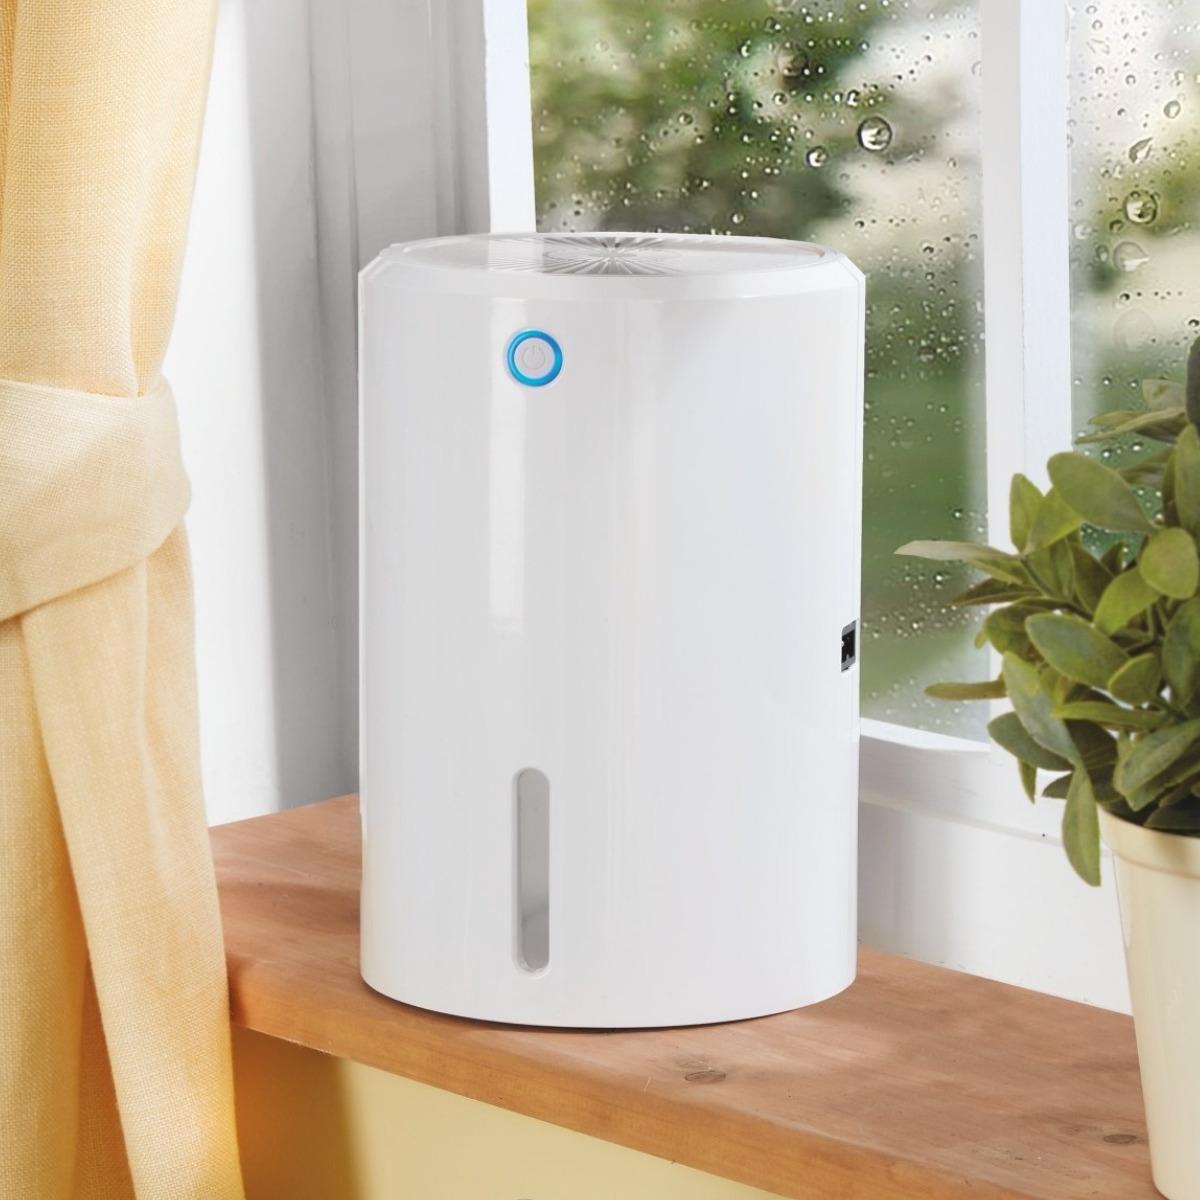 10-gadget-per-rimanere-al-fresco-d'estate-in-casa-20